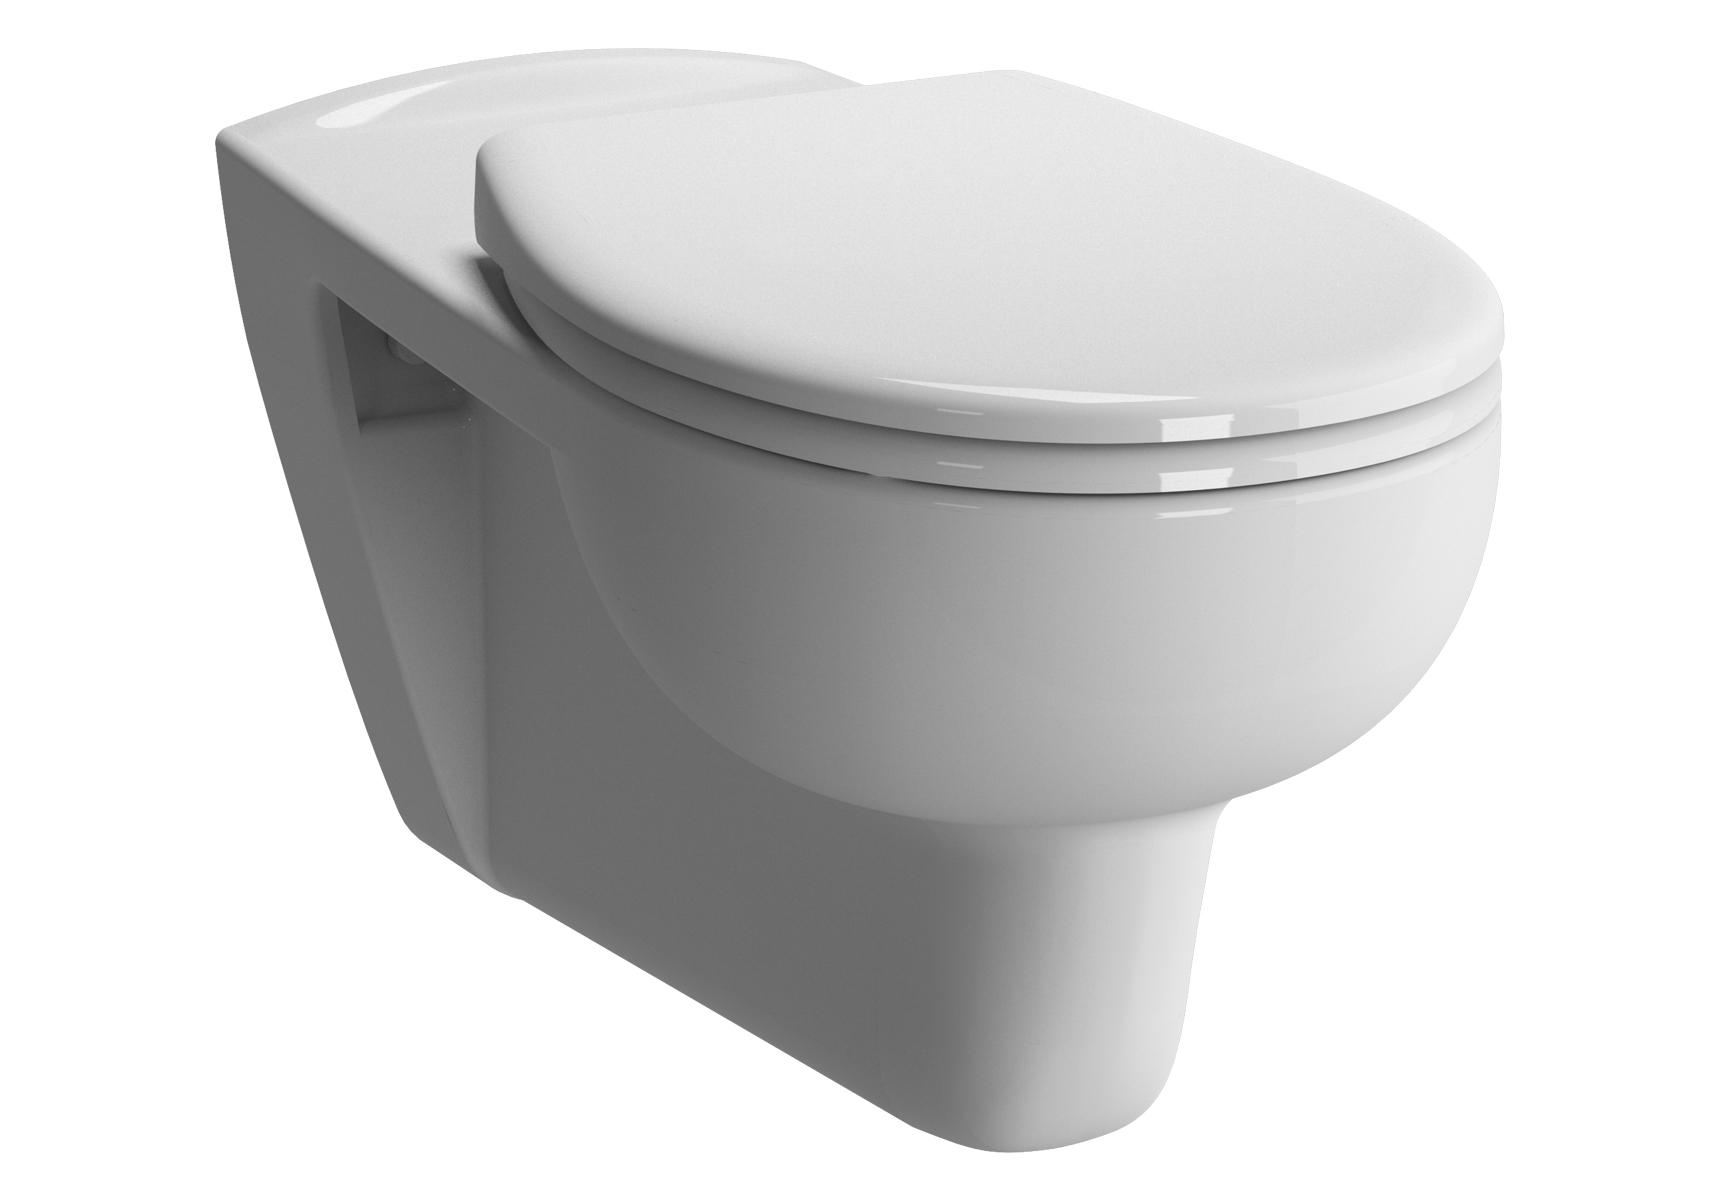 Conforma Wand-WC VitrA Flush mit Bidetfunktion, Weiß